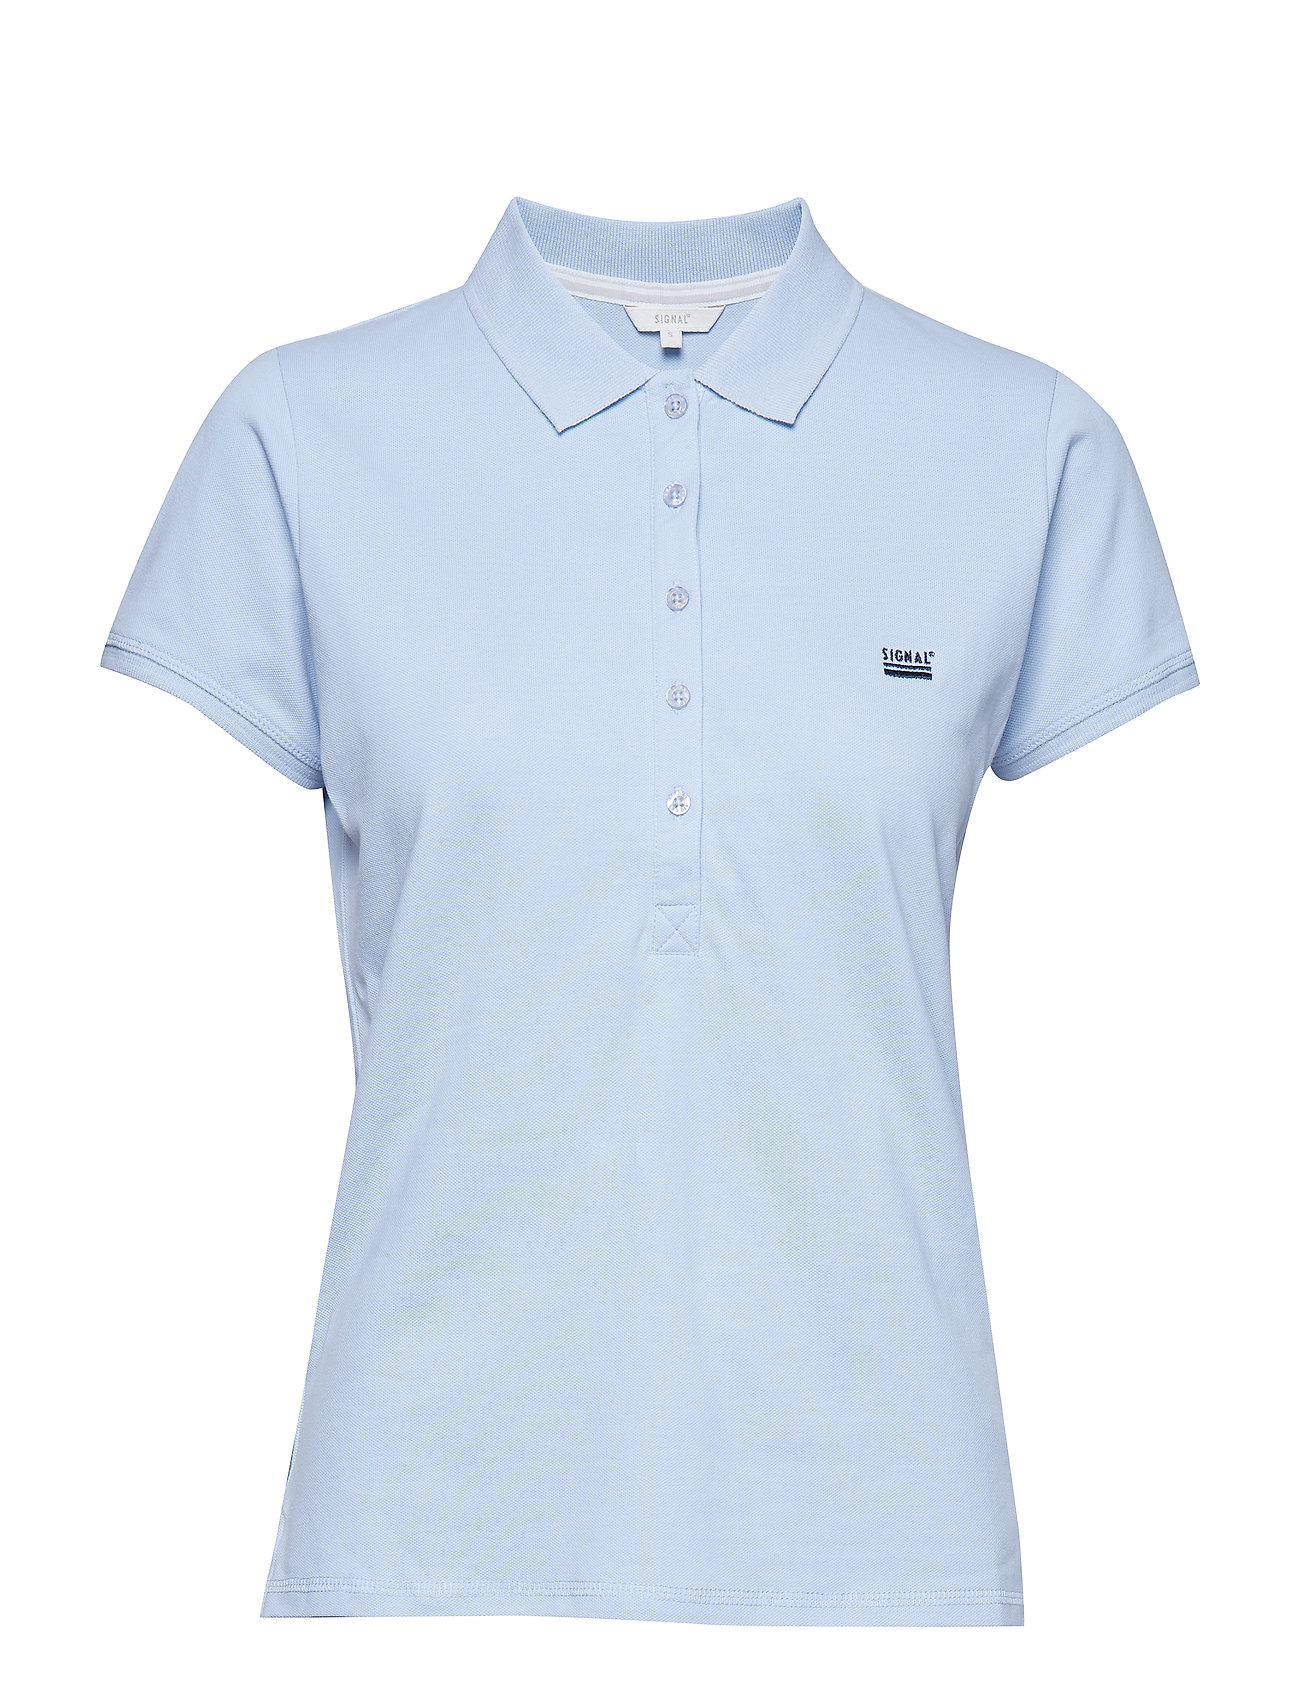 Image of T-Shirt/Top T-Shirts & Tops Polos Blå Signal (3119380335)